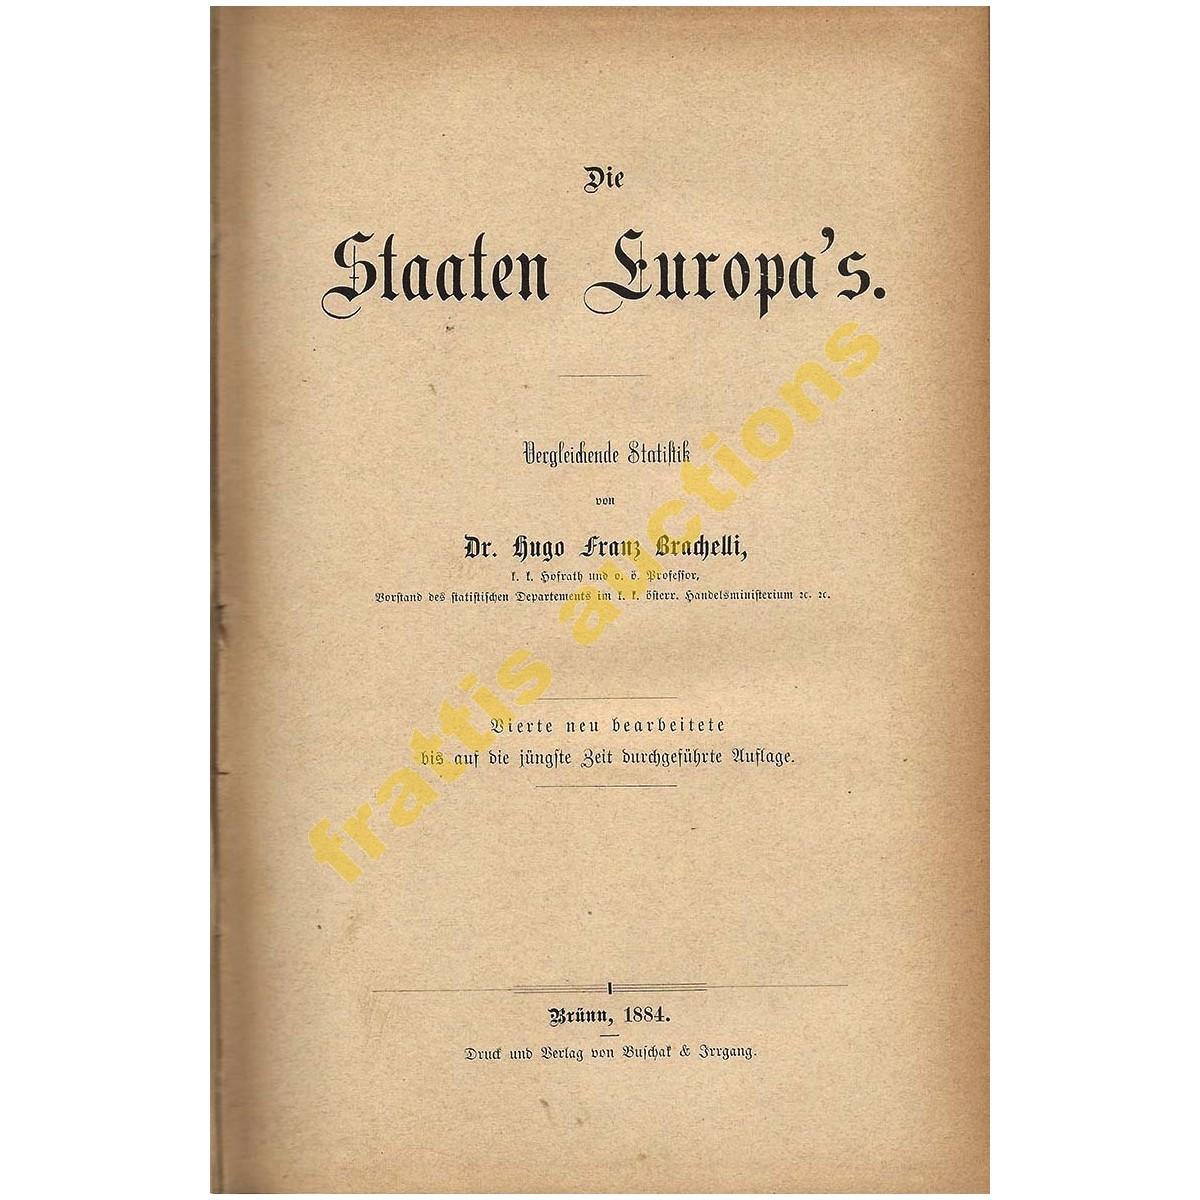 Die Staaten Europa's, Brachelli,1884.